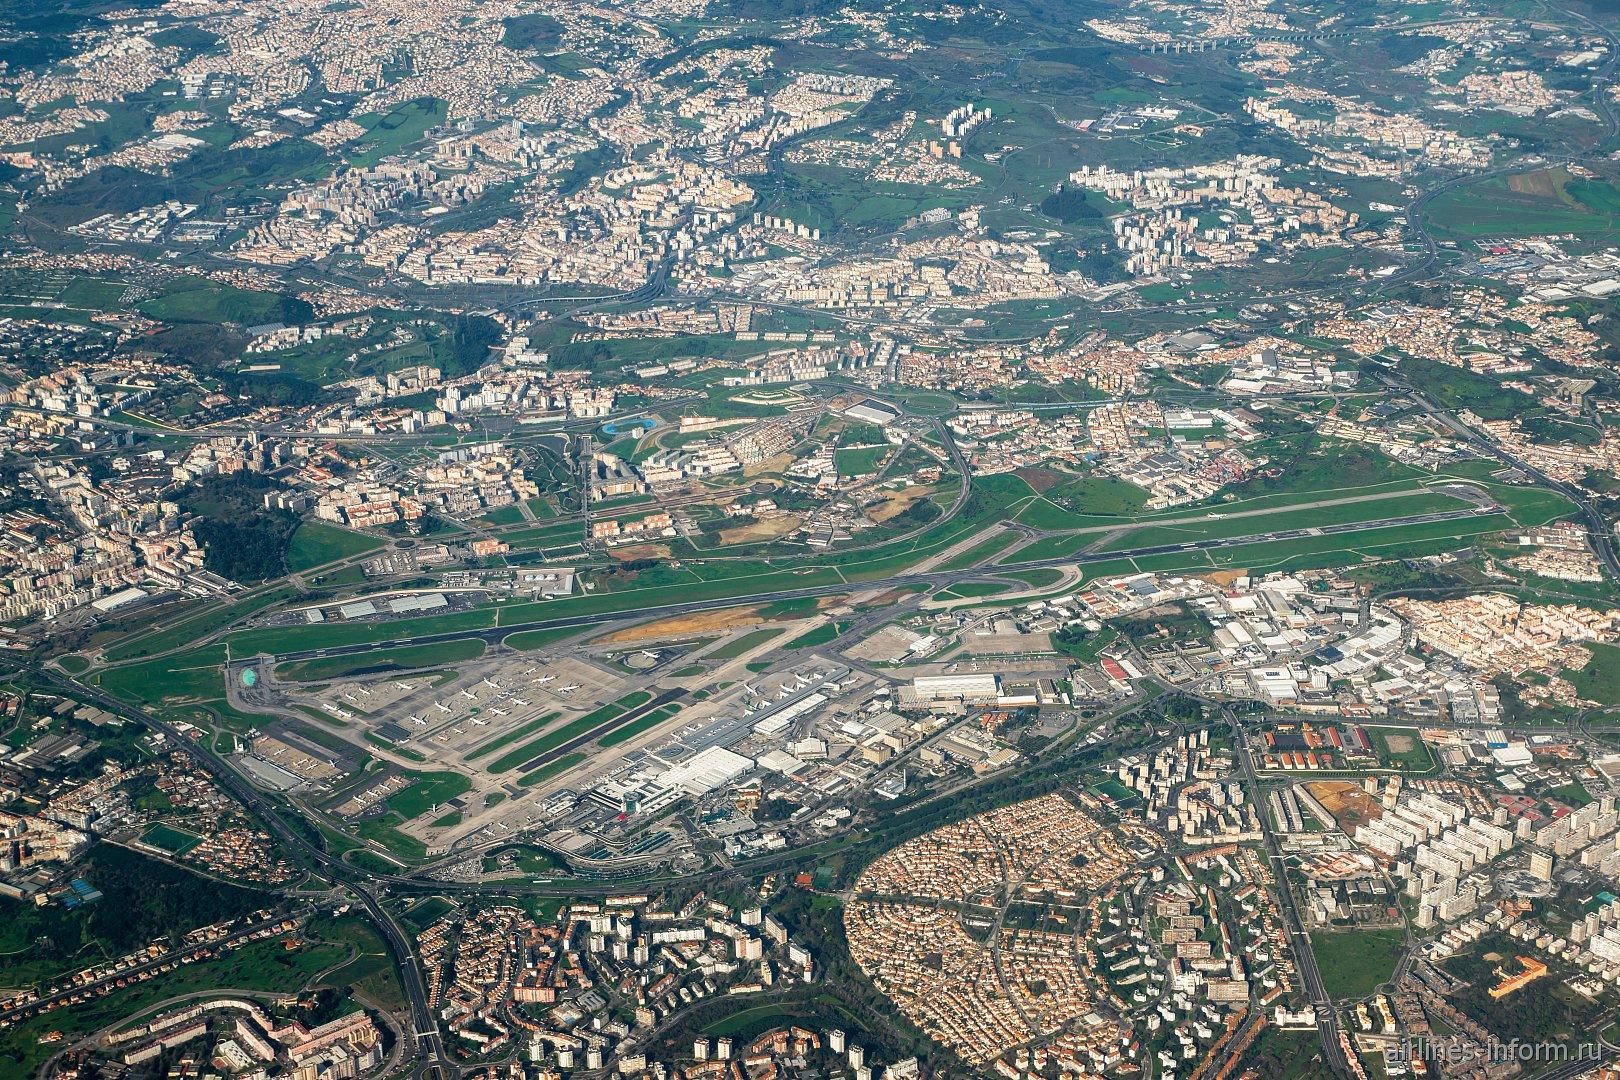 Вид сверху на аэропорт Лиссабон имени Умберту Делгаду